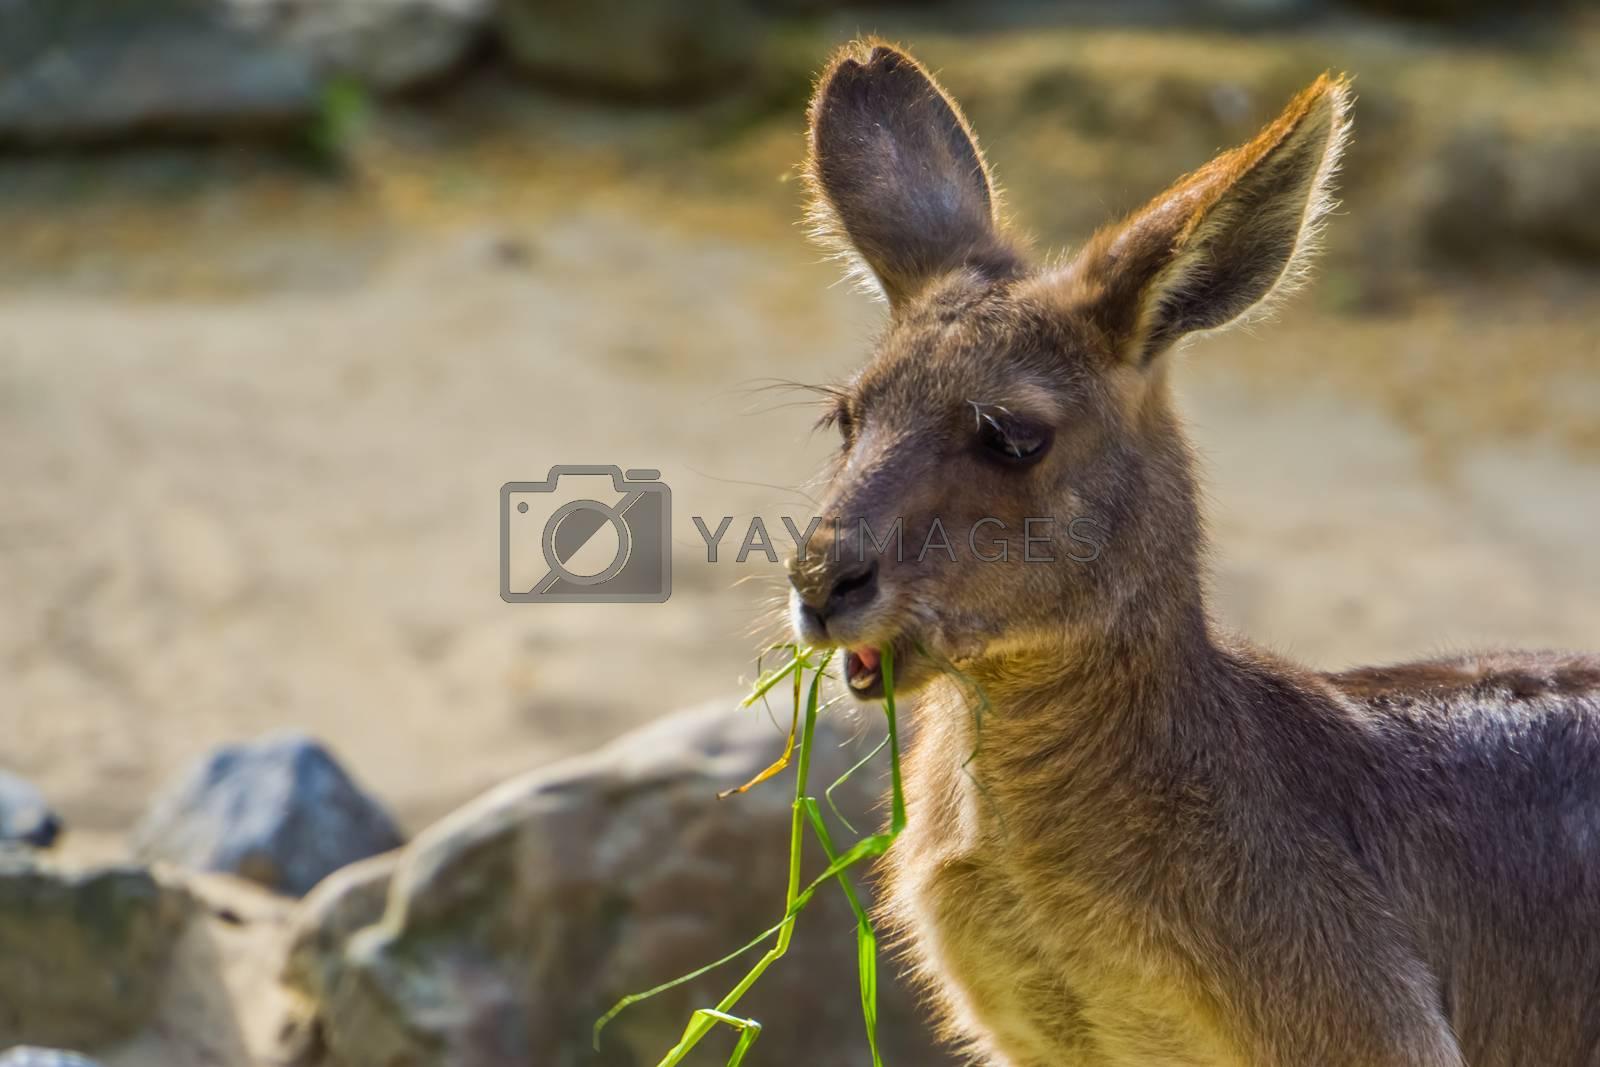 closeup of a eastern grey kangaroo eating grass, Marsupial from Australia